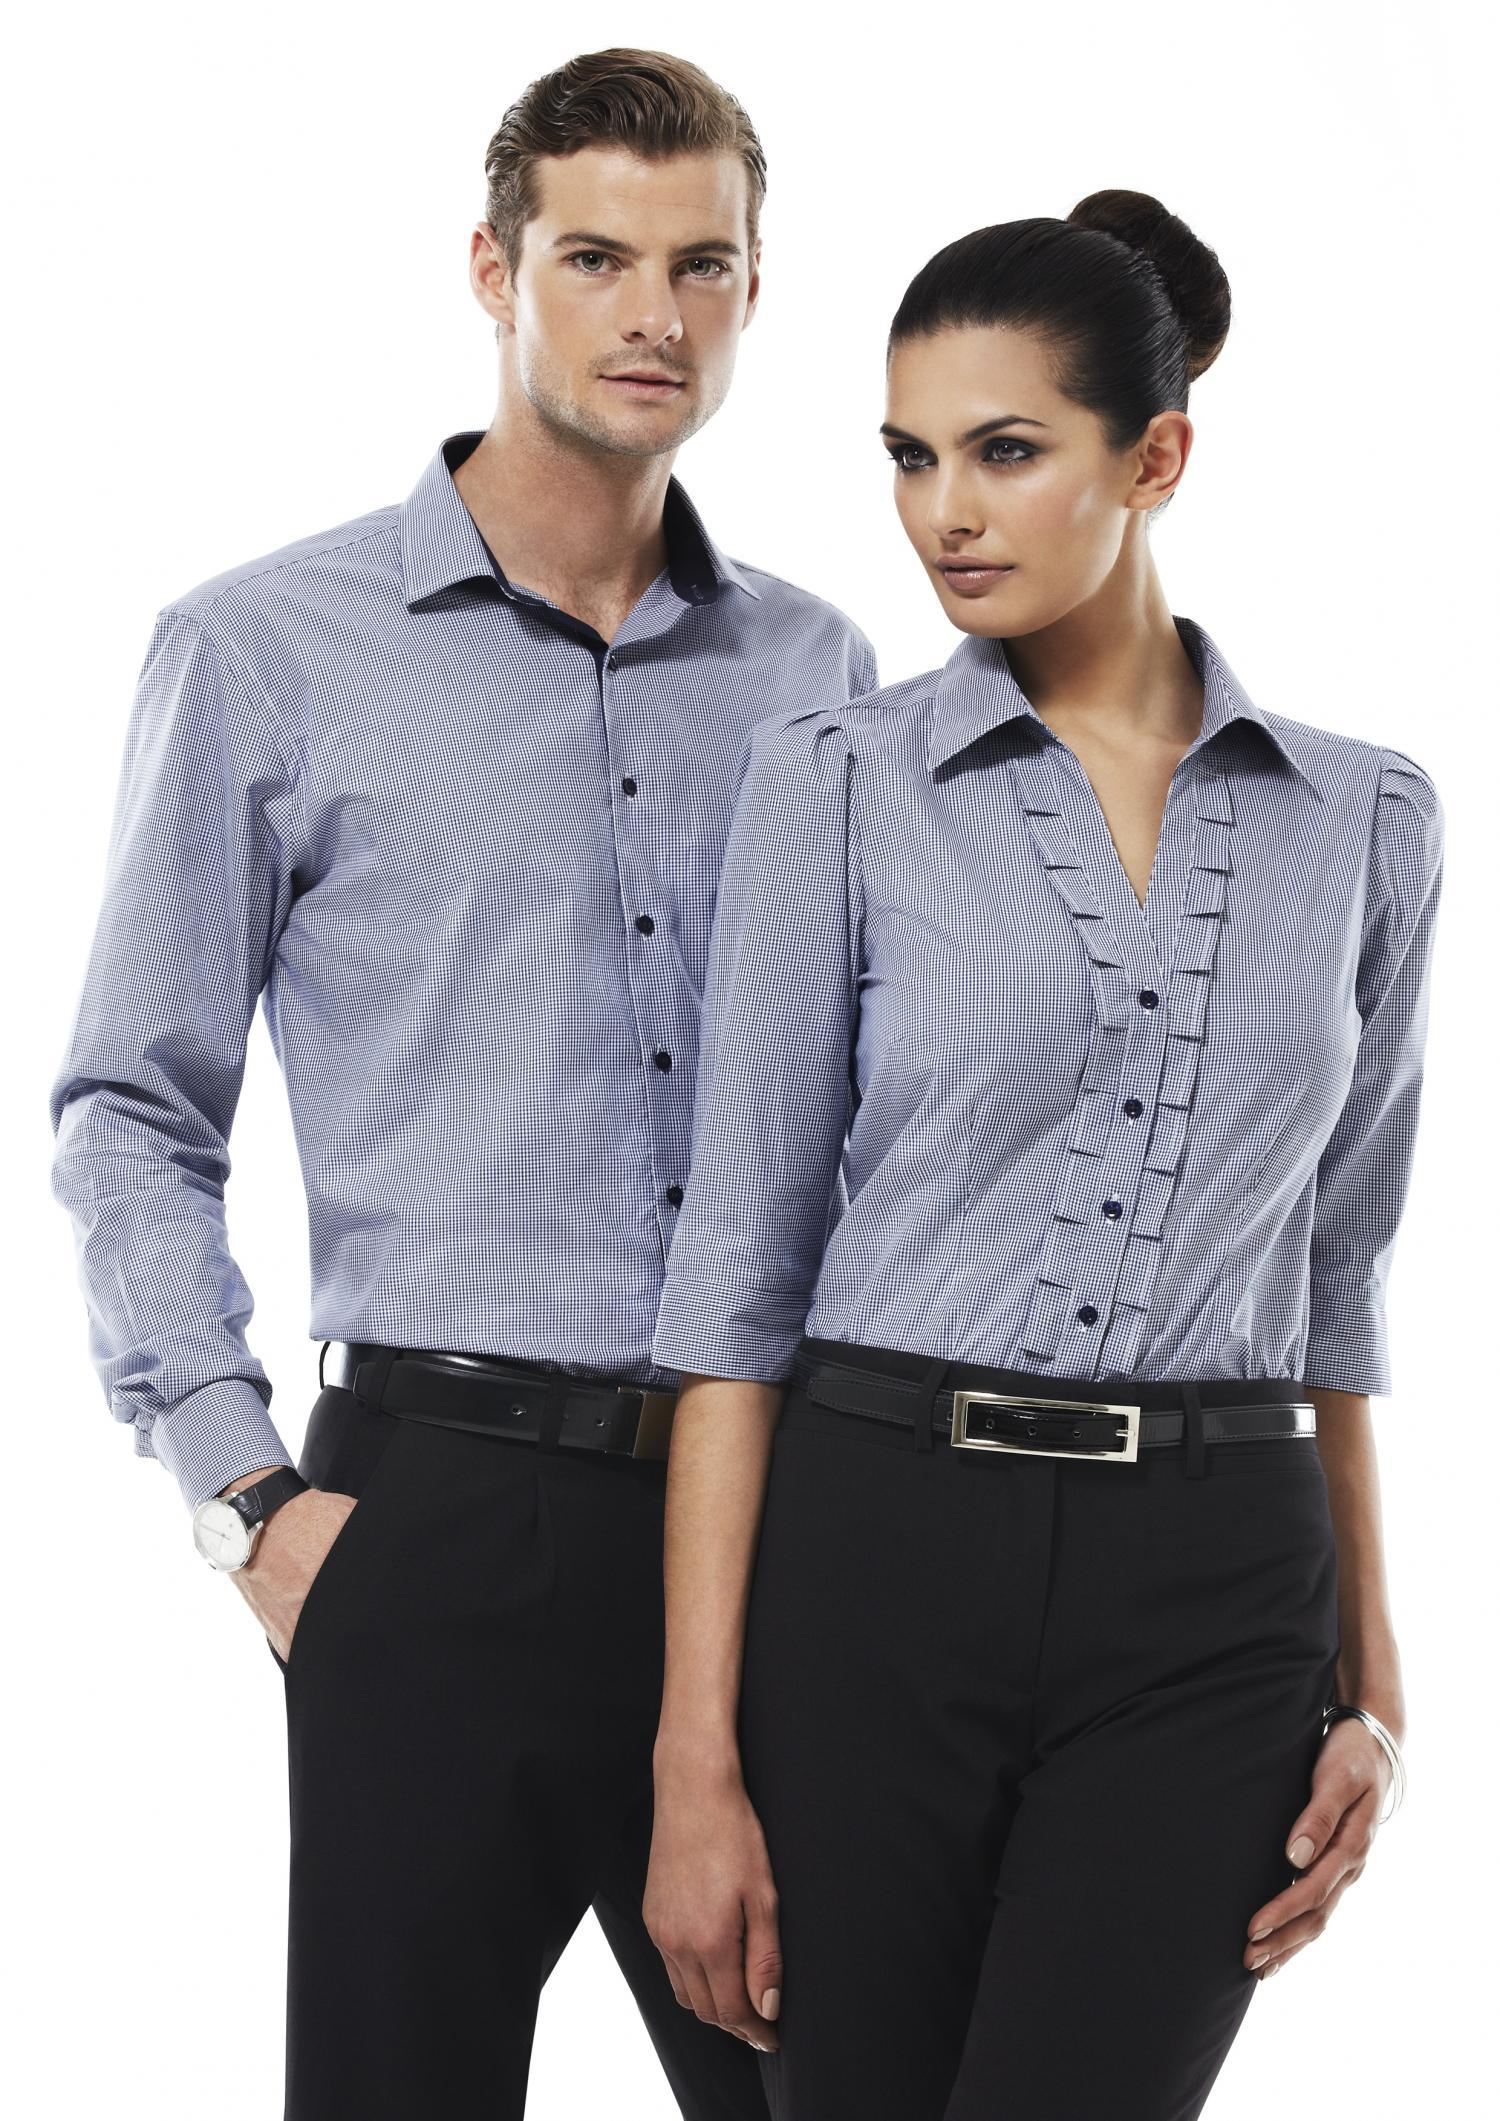 Mens l s edge shirt business shirts the uniform factory for Business shirts for men